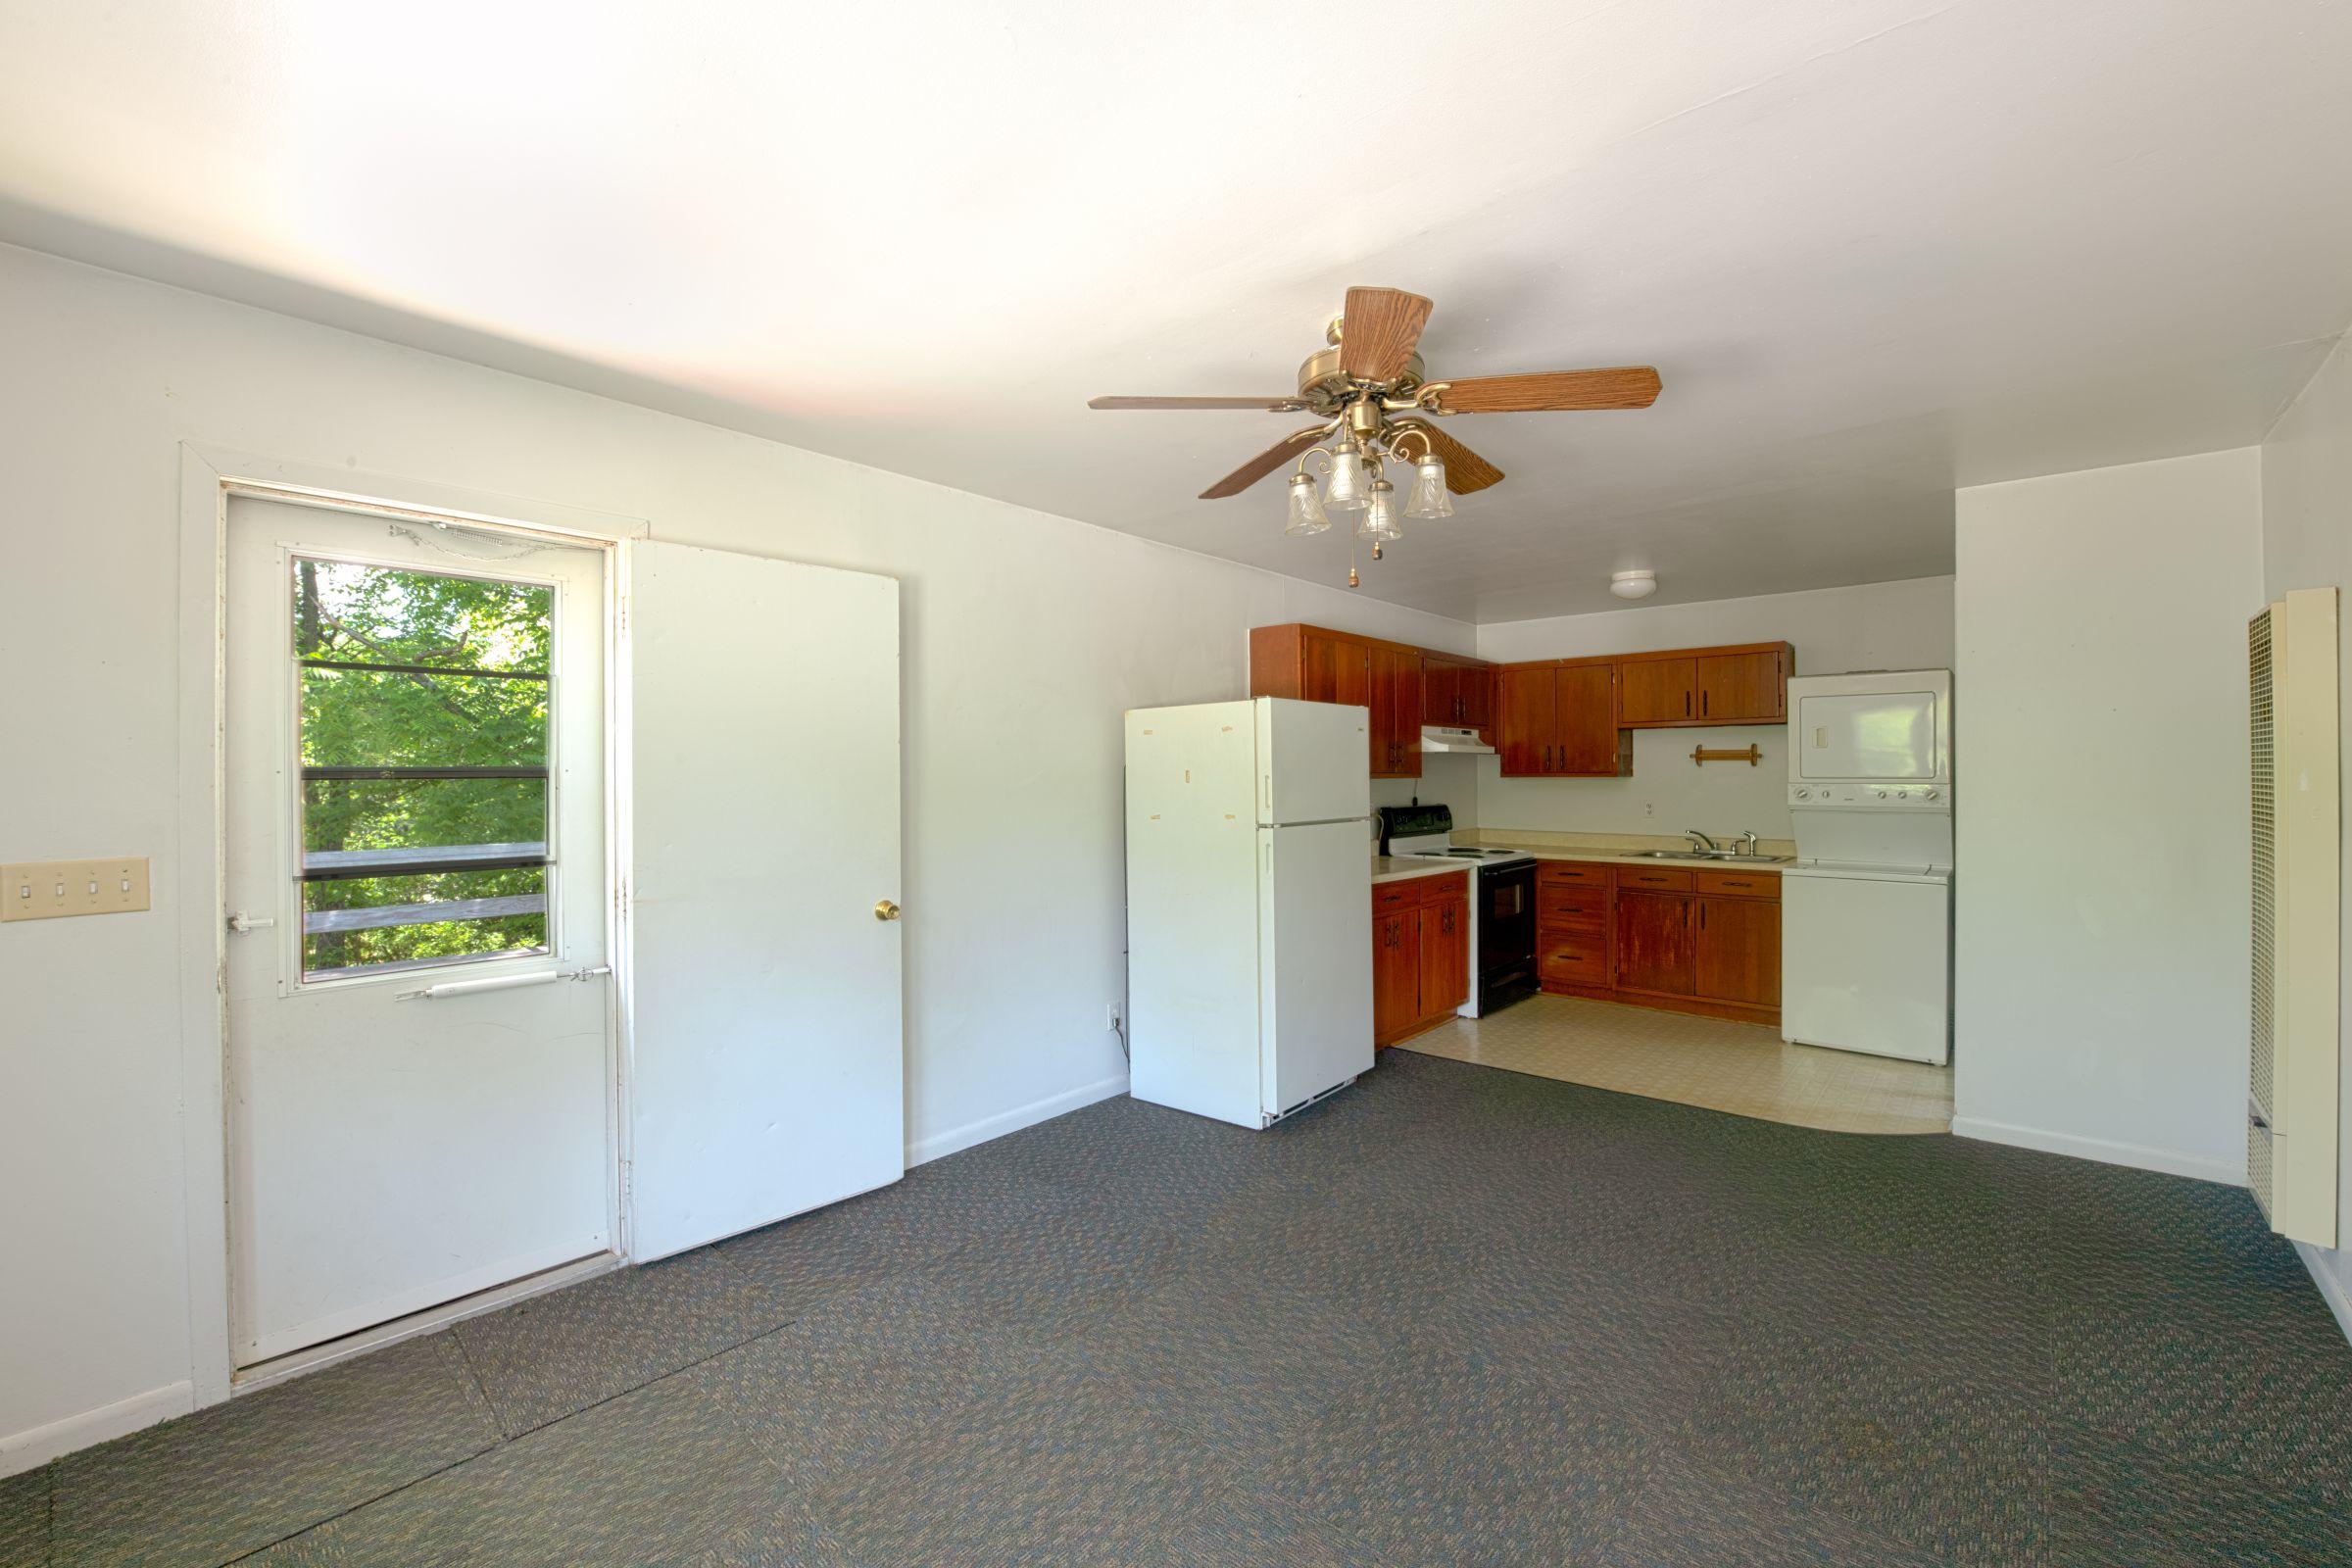 residential-warren-county-iowa-2-acres-listing-number-15576-0-2021-06-11-201639.jpg